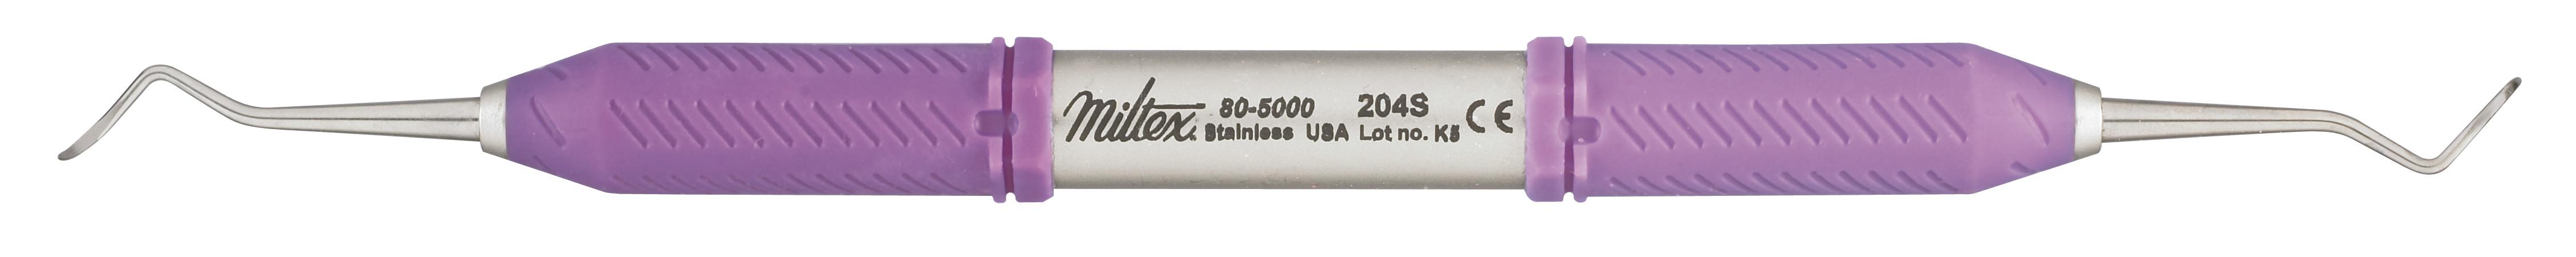 204s-scaler-griplite-s6-80-5000-miltex.jpg